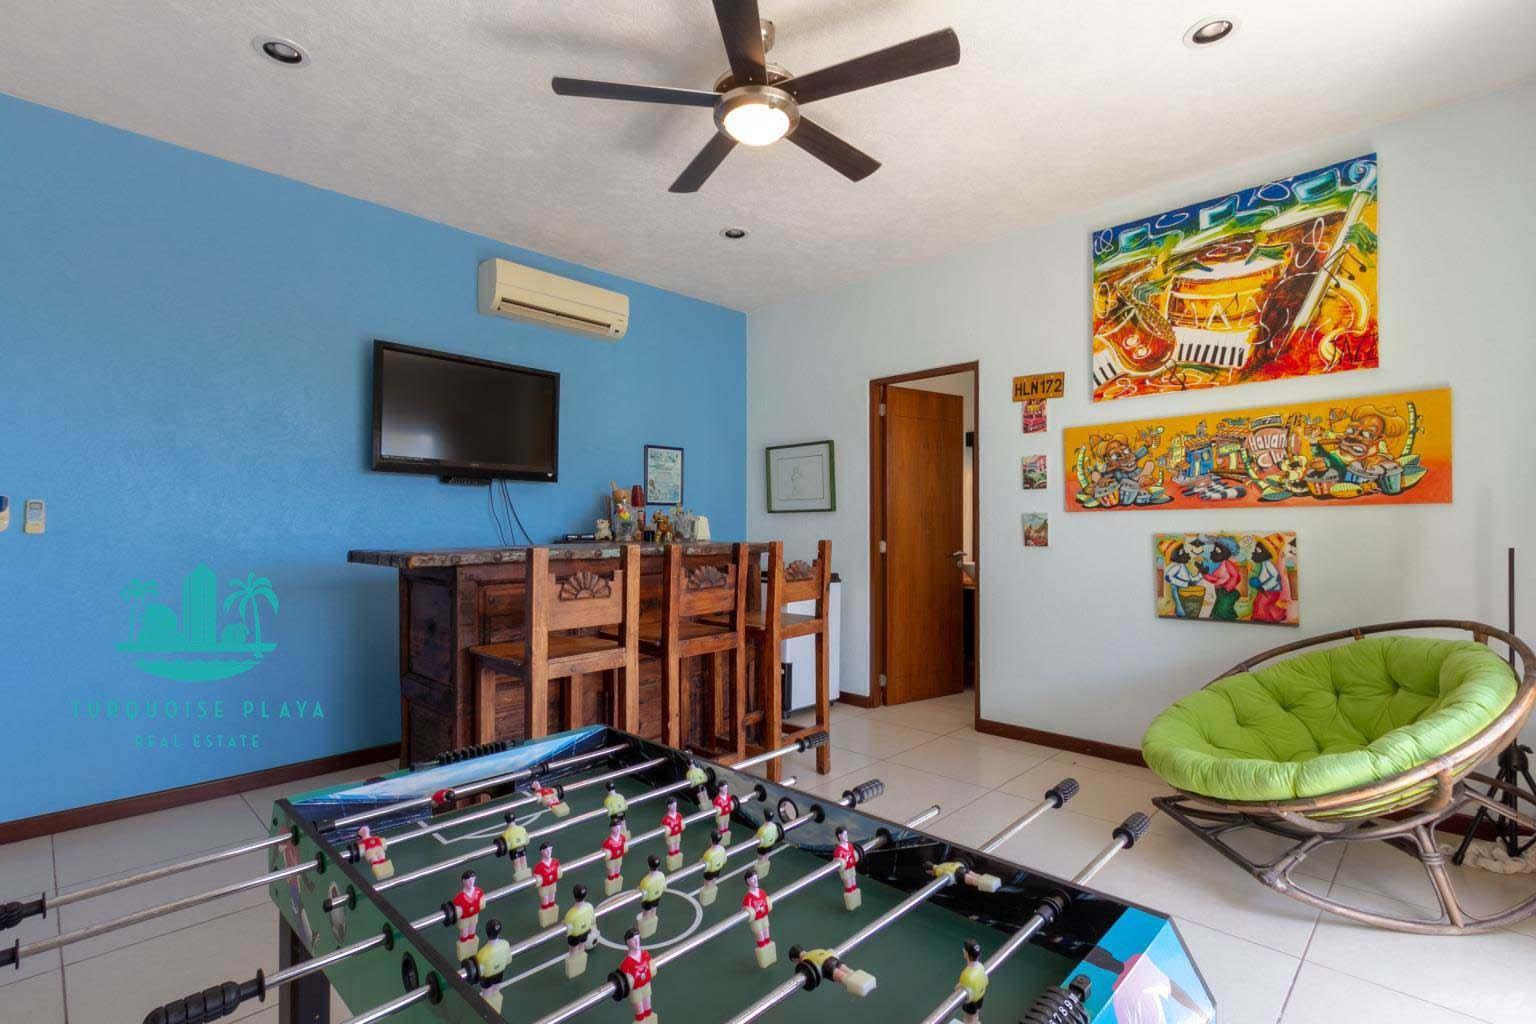 406bedcd671f0a85779f3da18459591ed9b63b61 - 4-Bedroom Penthouse only $289,000 USD